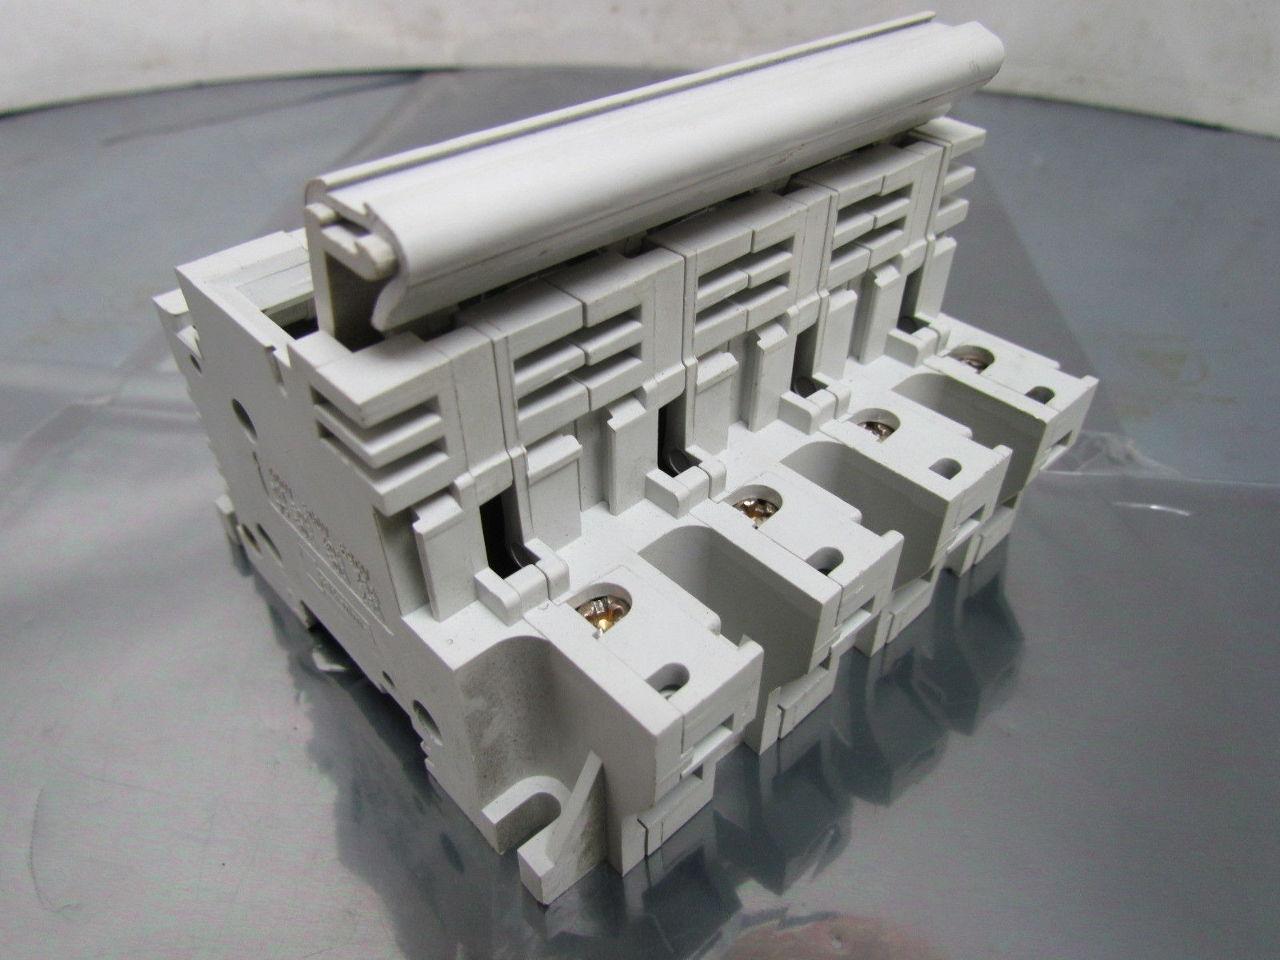 home fuse box labeling fuse box labeling legrand 21505 14x51 fuse holder 400 500 690v 50 50 25a